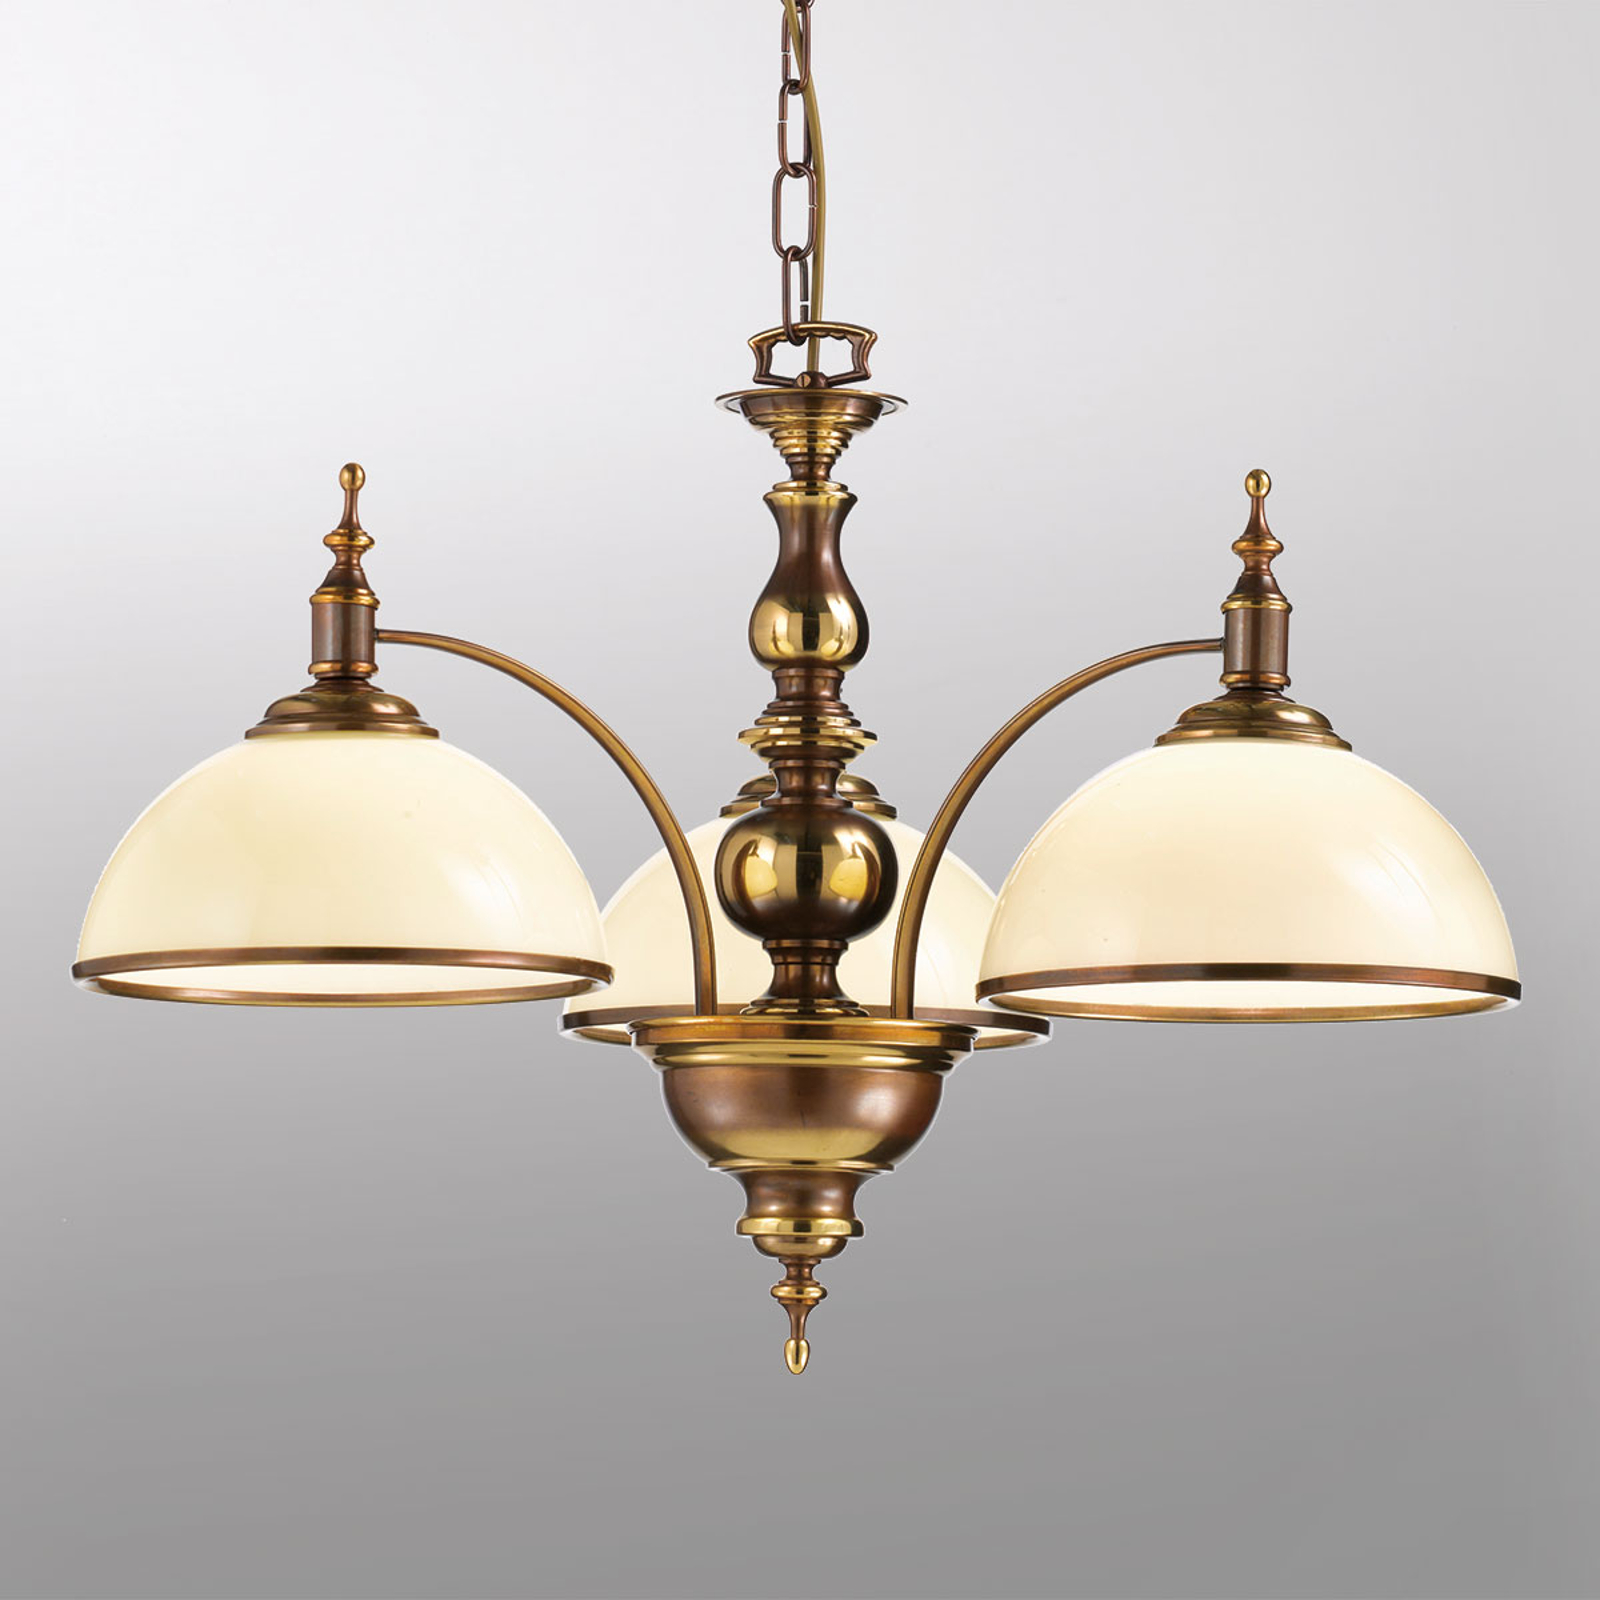 Antique-looking Corola hanging lamp, three-bulb_2008209_1